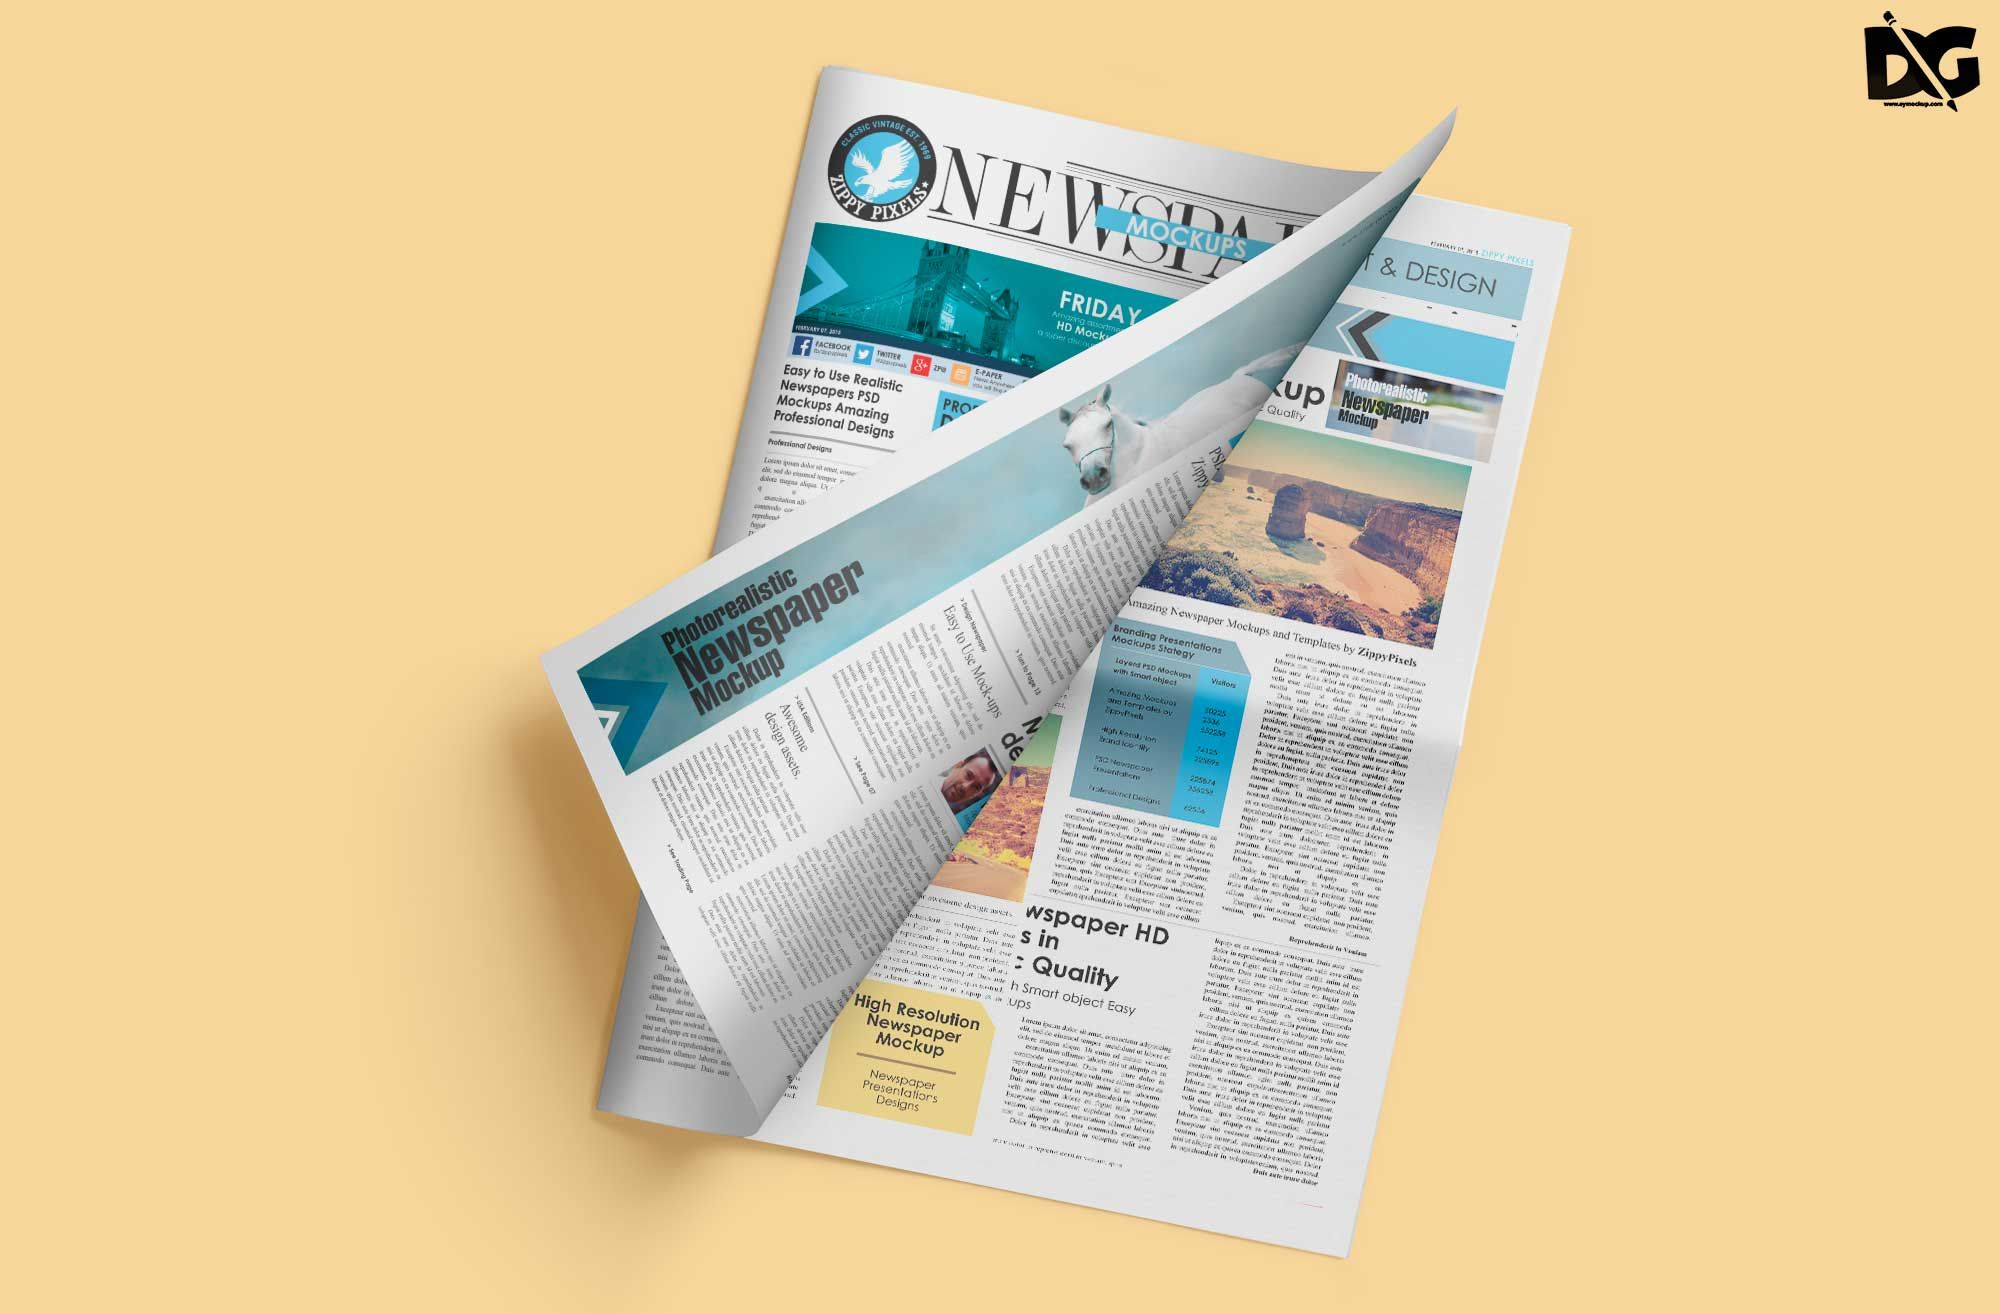 Download Free Broad Sheet Newspaper Psd Mockup Newspapermockup Newspaperpsd Newspaperpsdmockup Psdmockup Paperm Mockup Free Psd Free Logo Mockup Logo Design Mockup